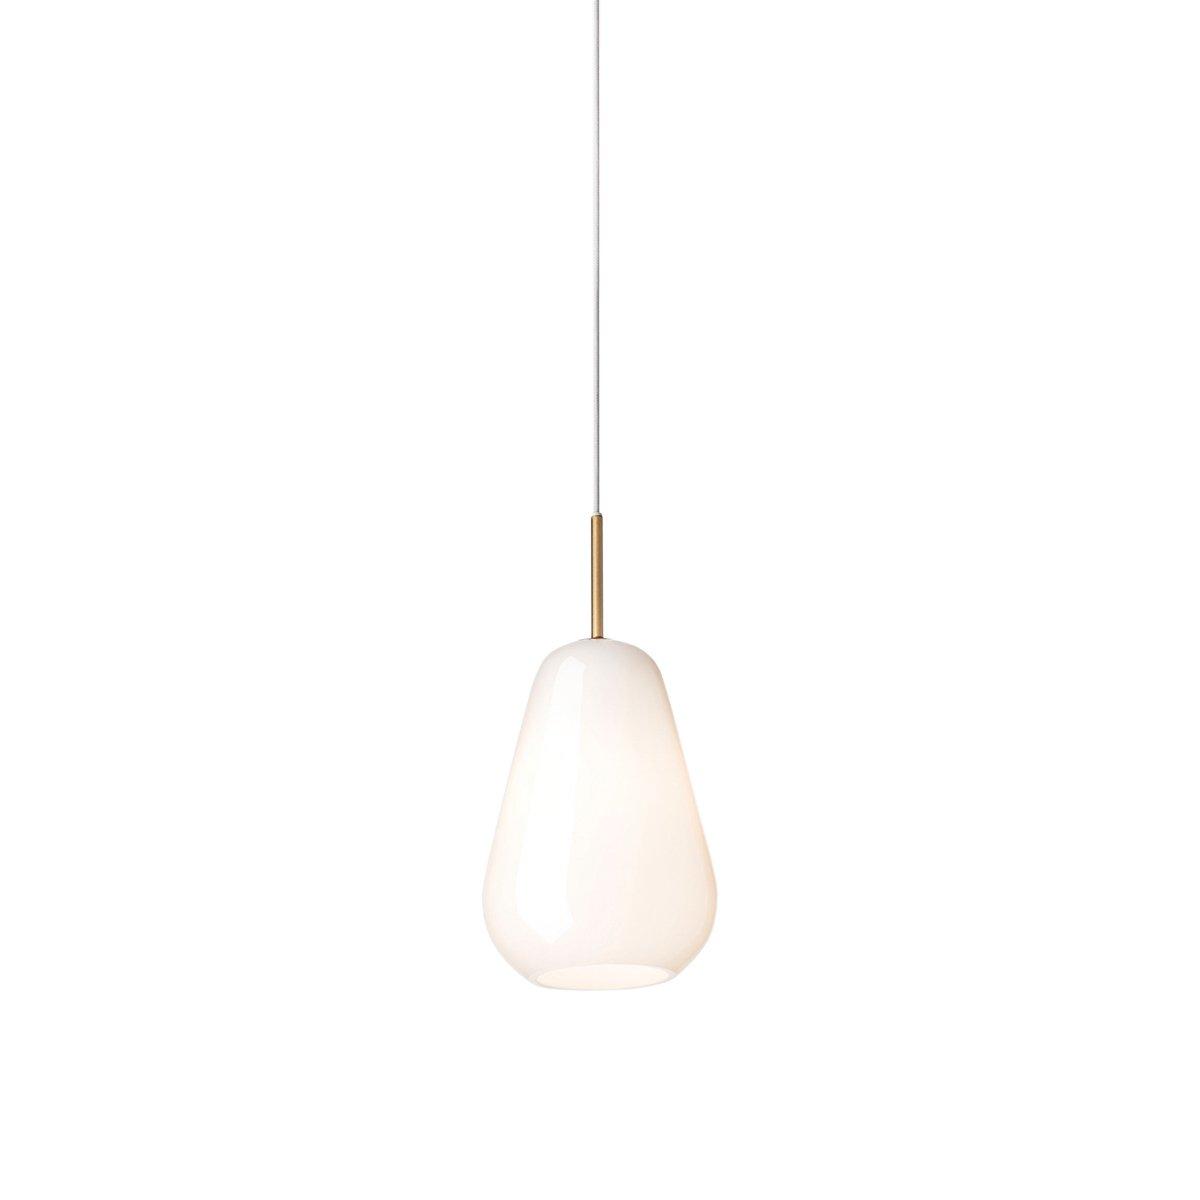 Nuura Anoli 1 Hanglamp